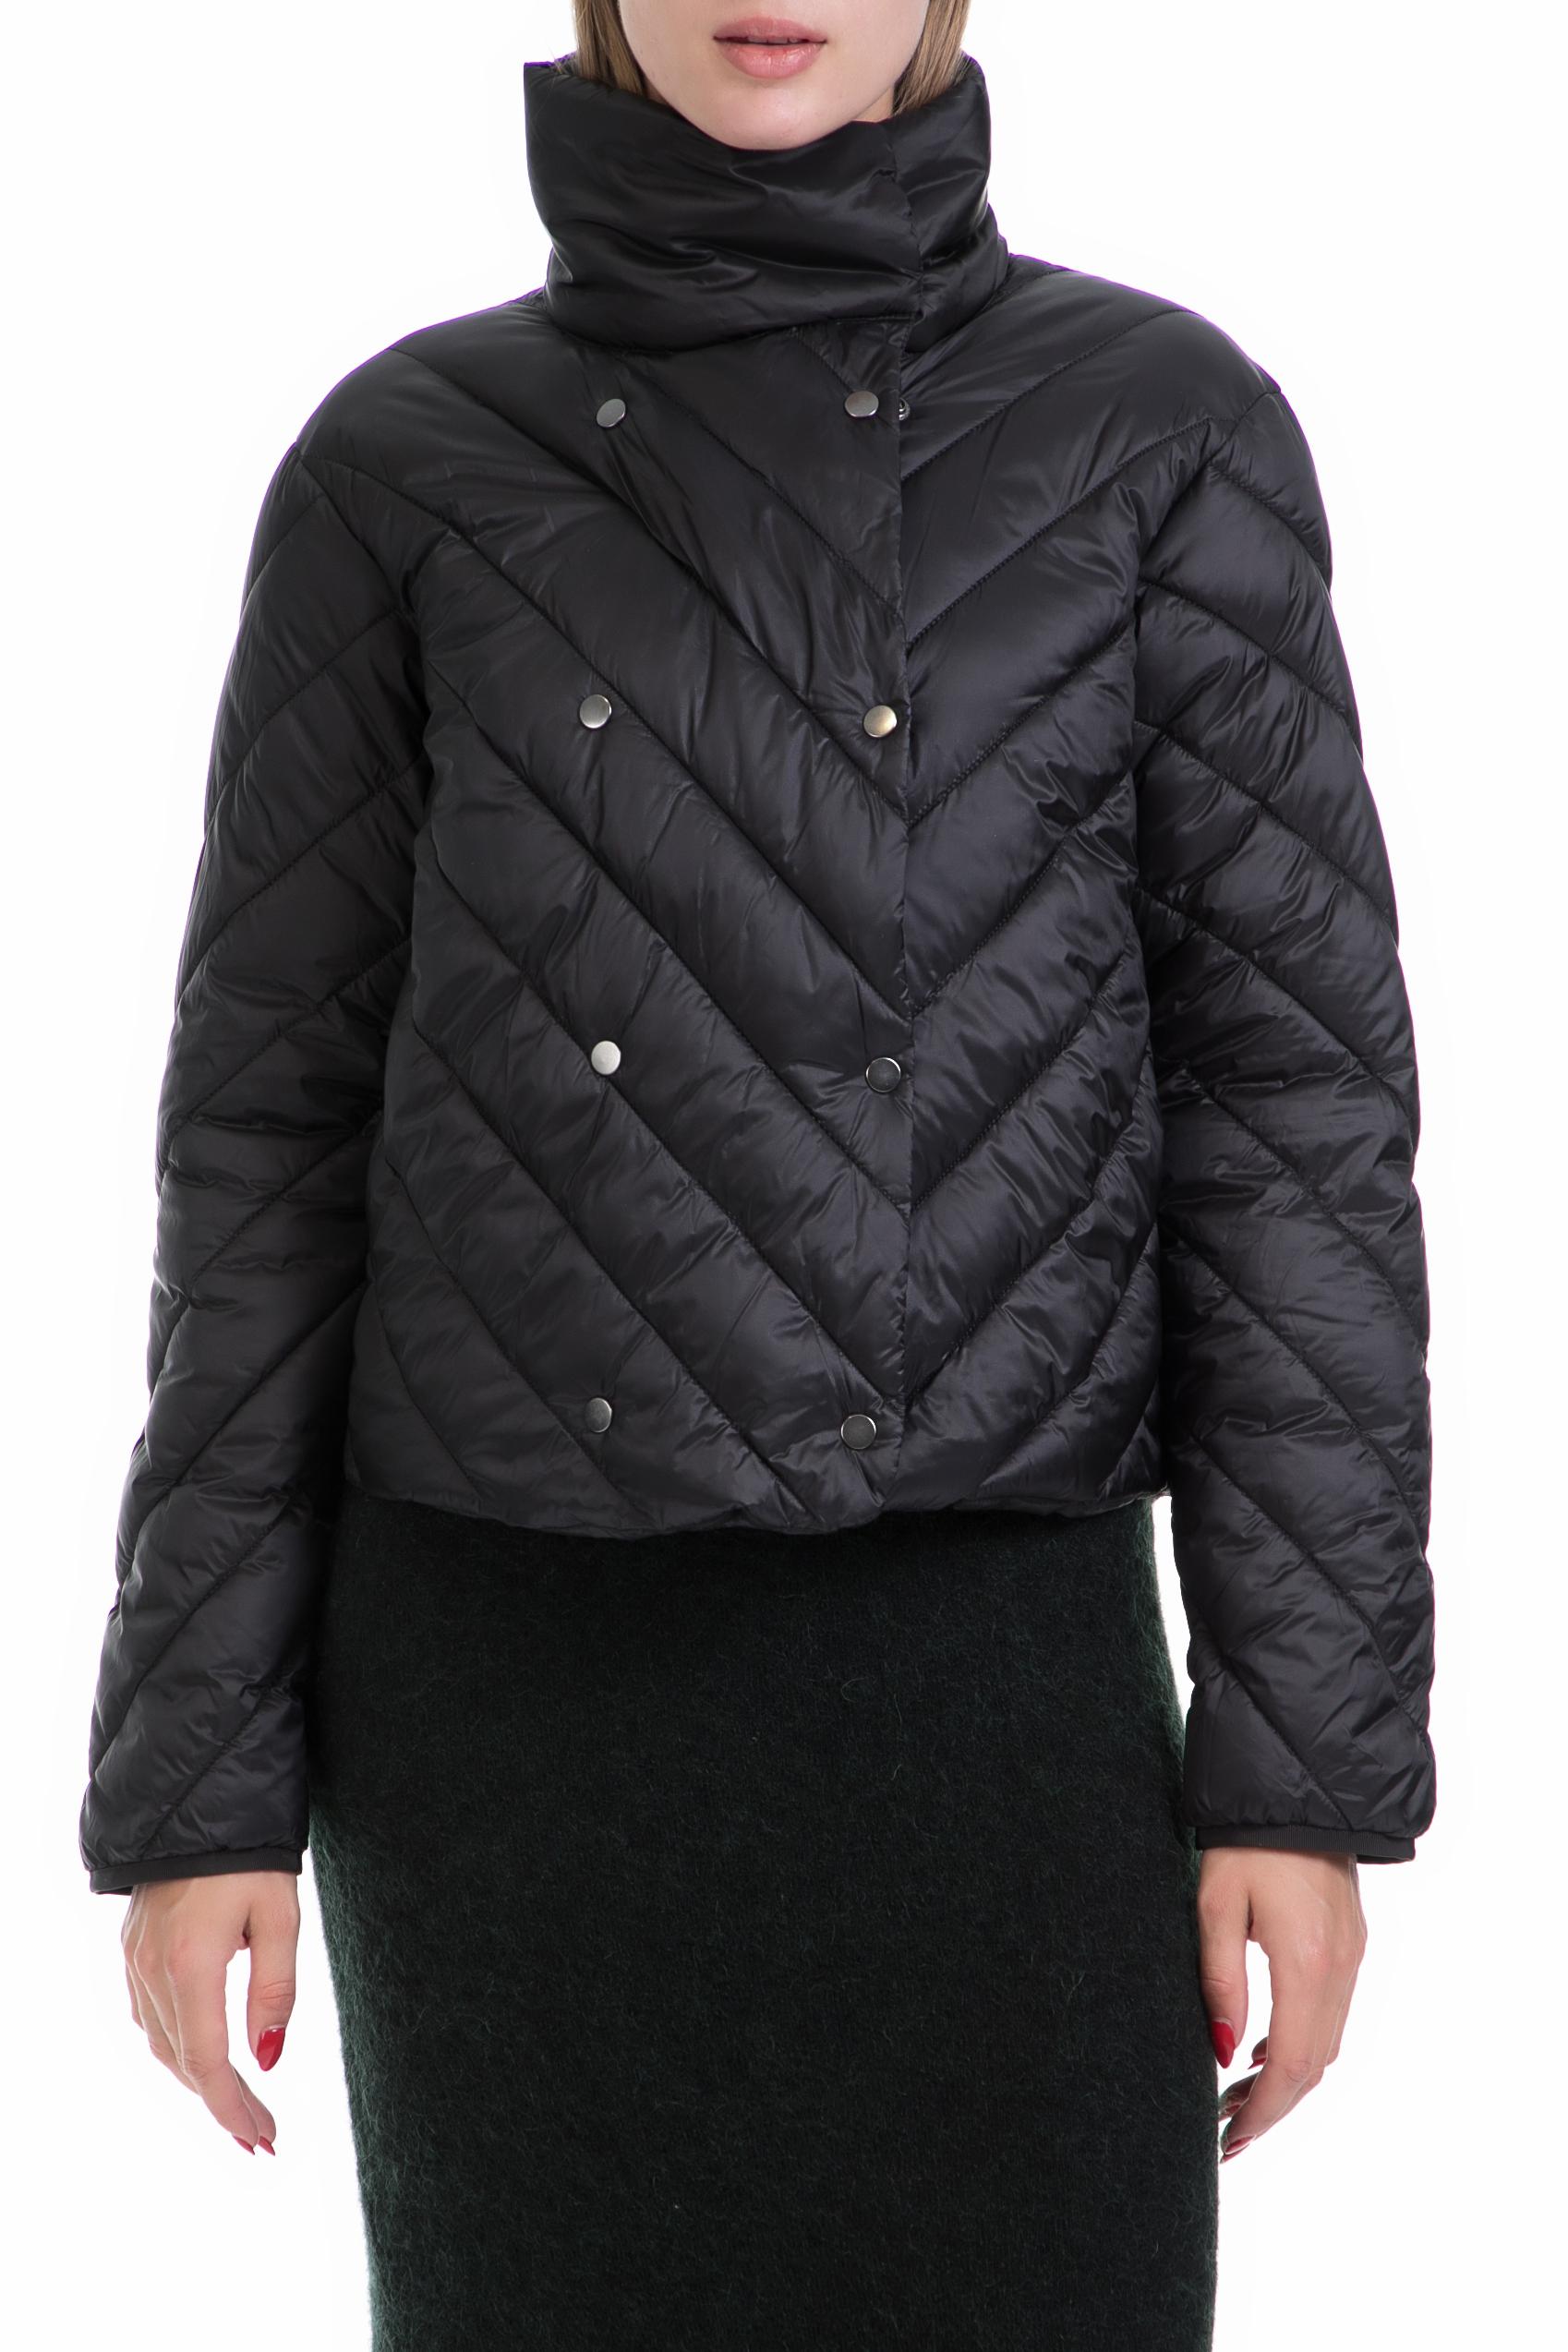 SCOTCH & SODA - Γυναικείο μπουφάν Nylon double breasted quilted μαύρο γυναικεία ρούχα πανωφόρια μπουφάν